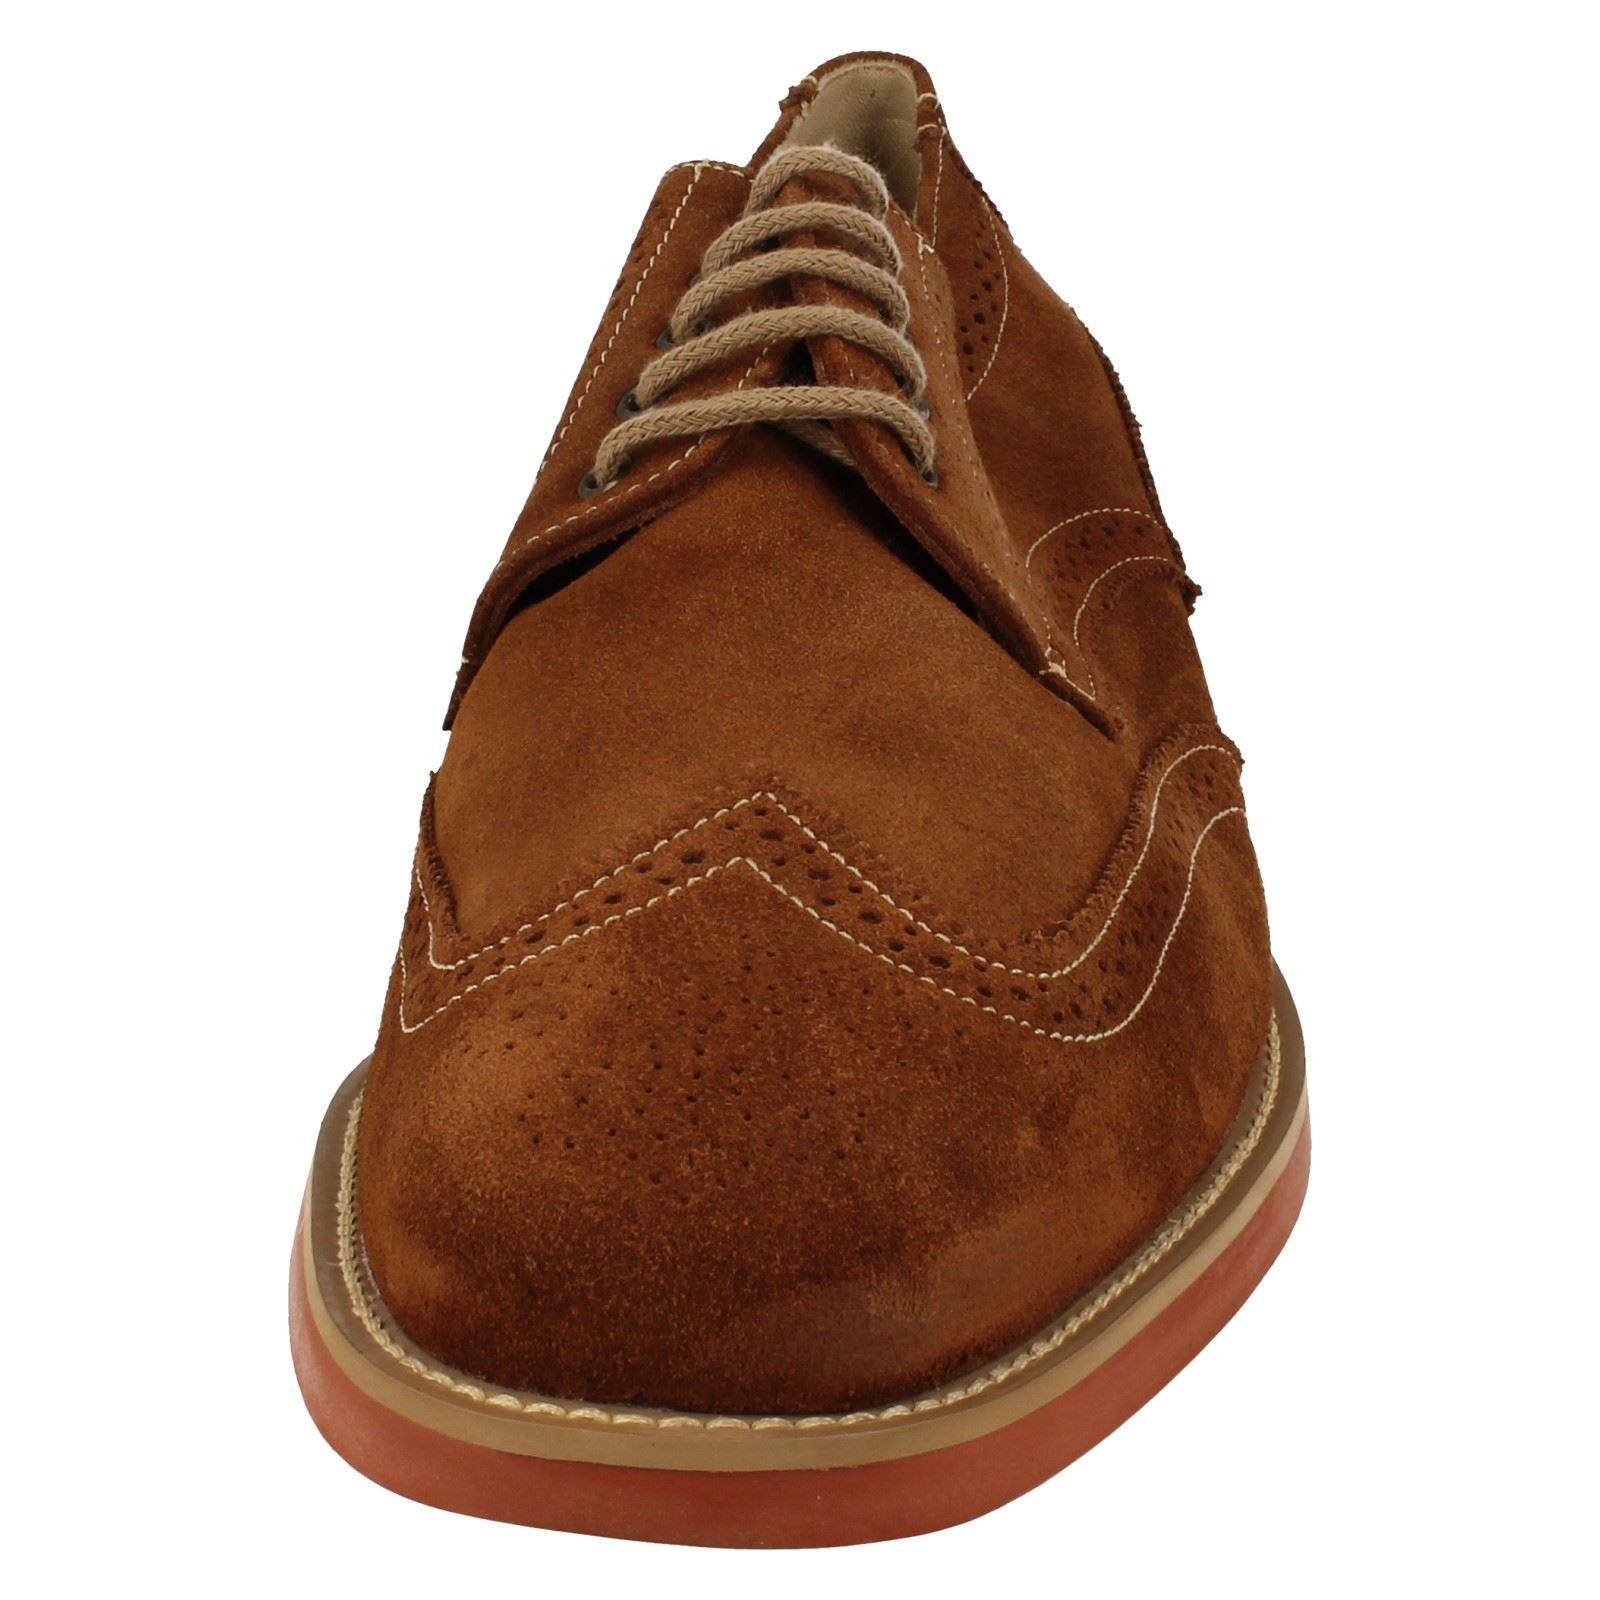 Anatomic Smart Men/'s Brogue Detailed Shoes Tucano